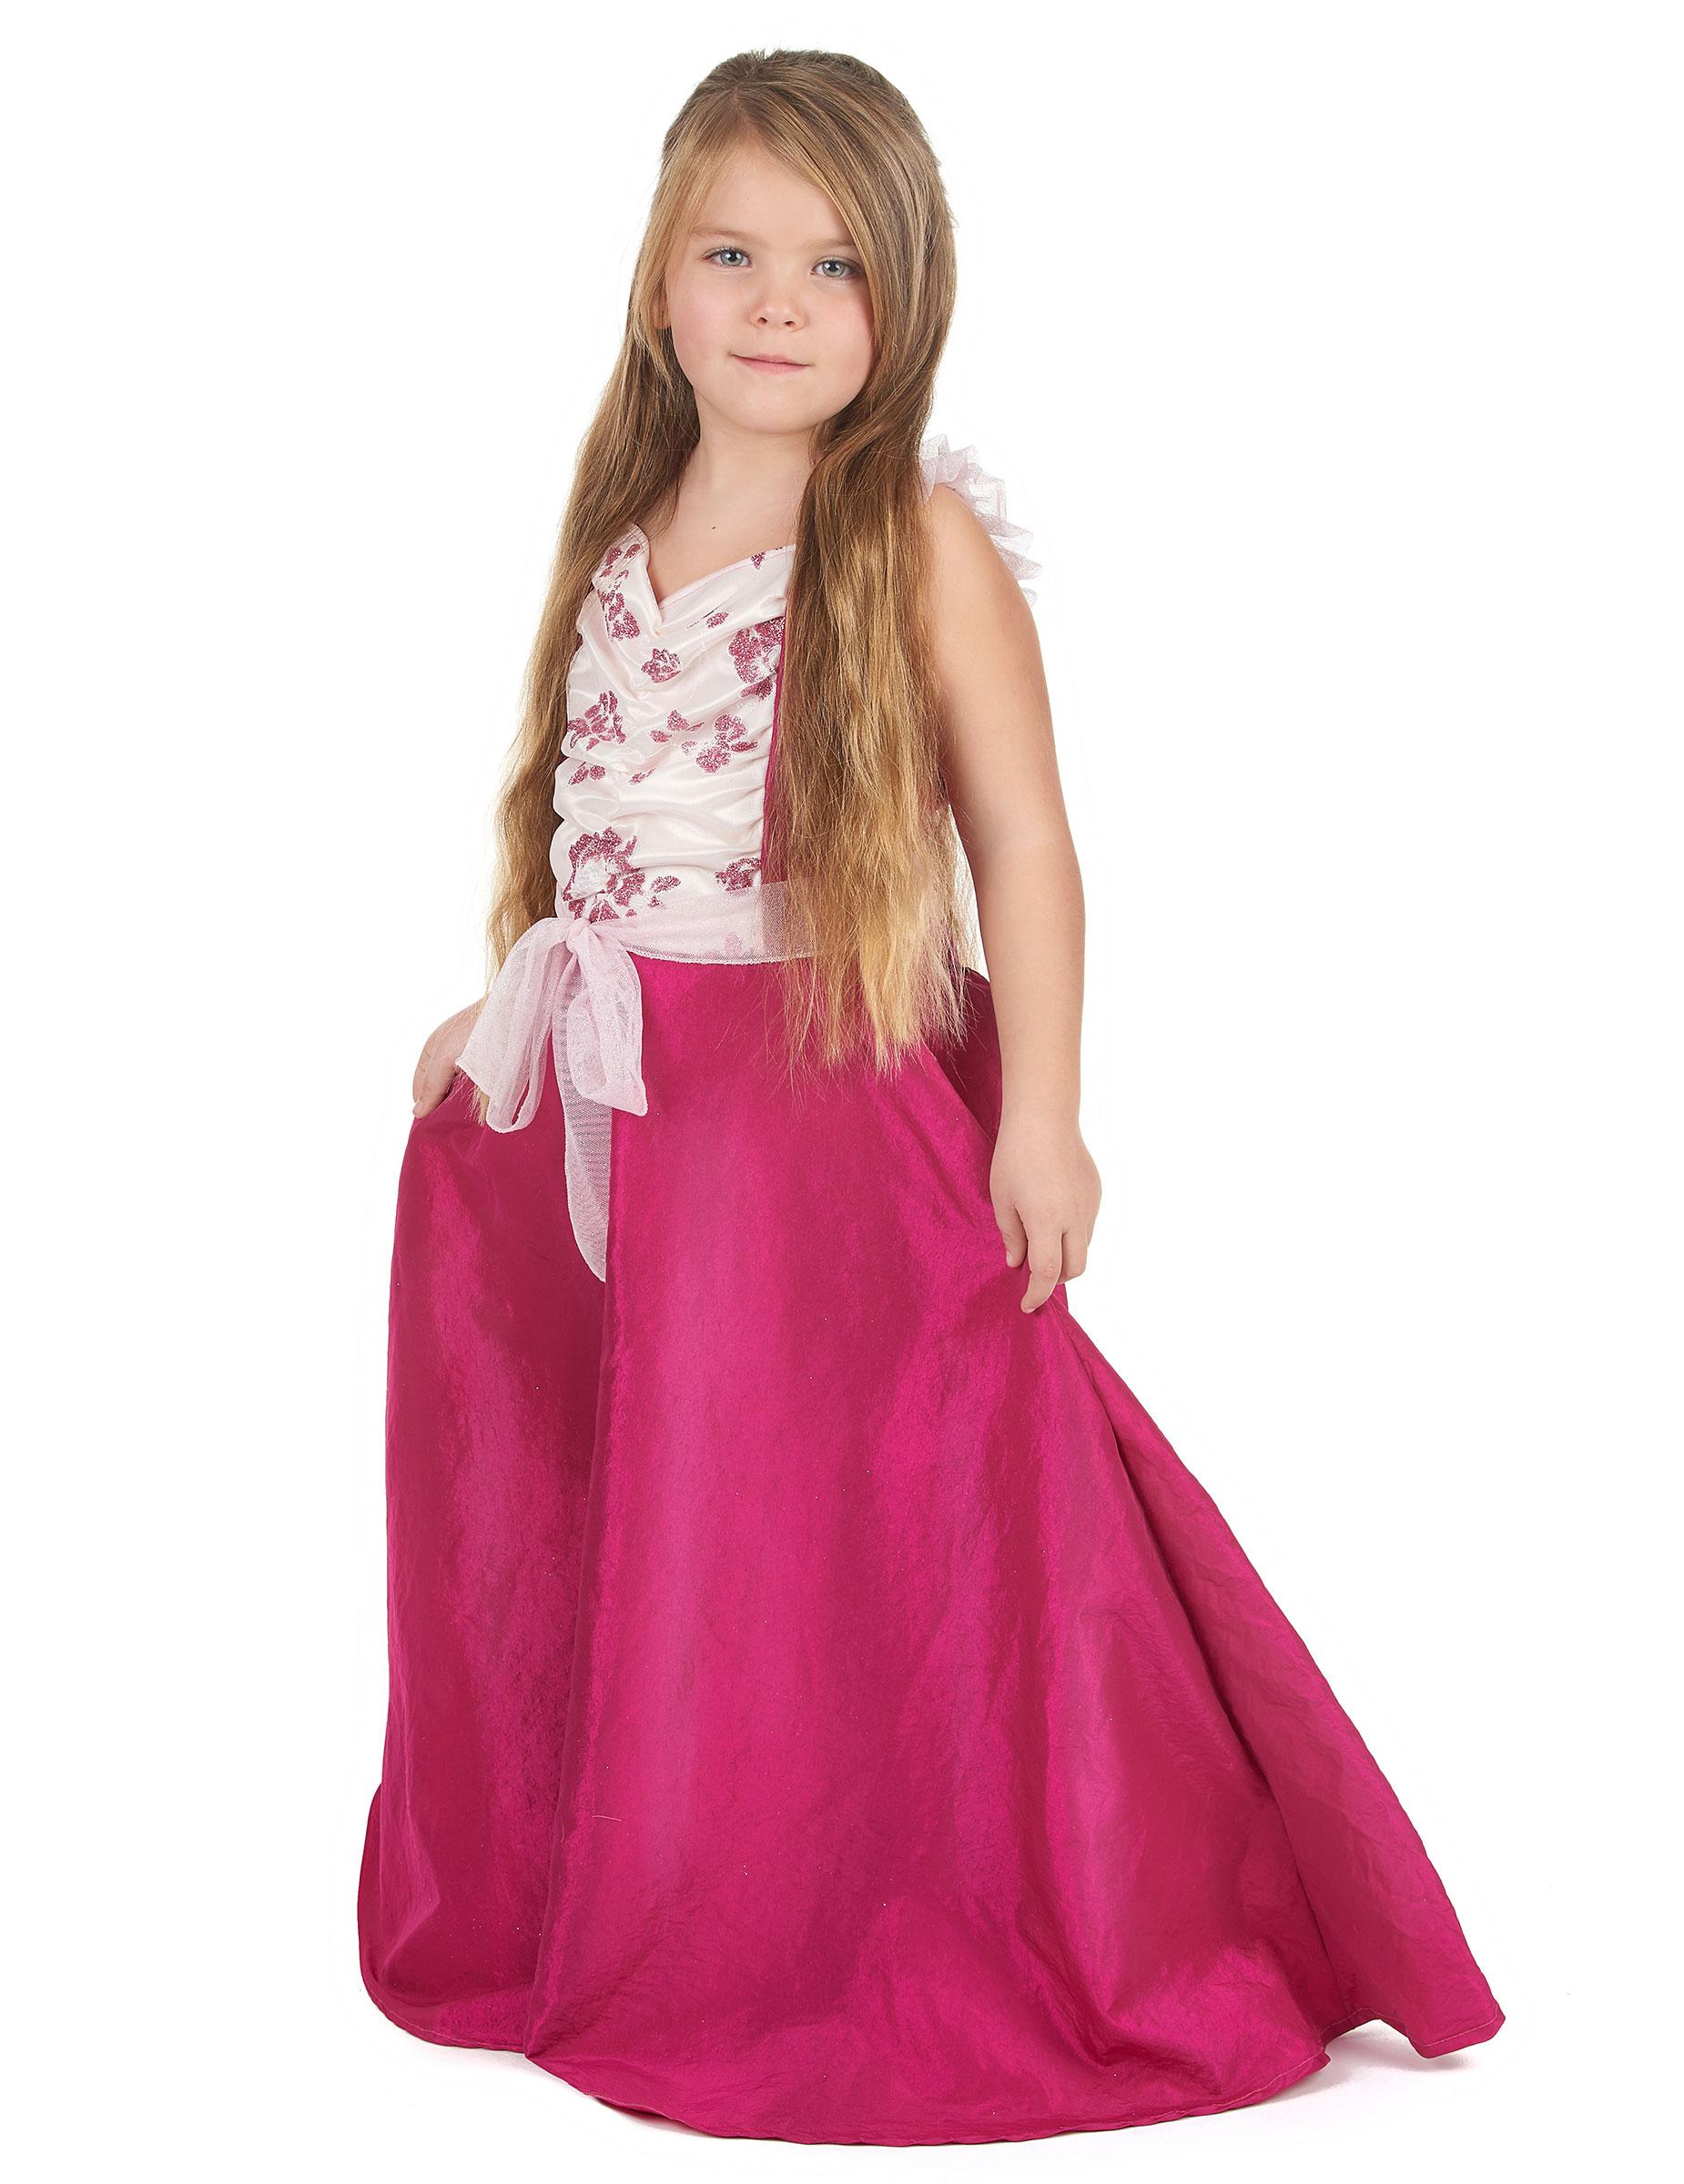 Deguisement robe bal des roses